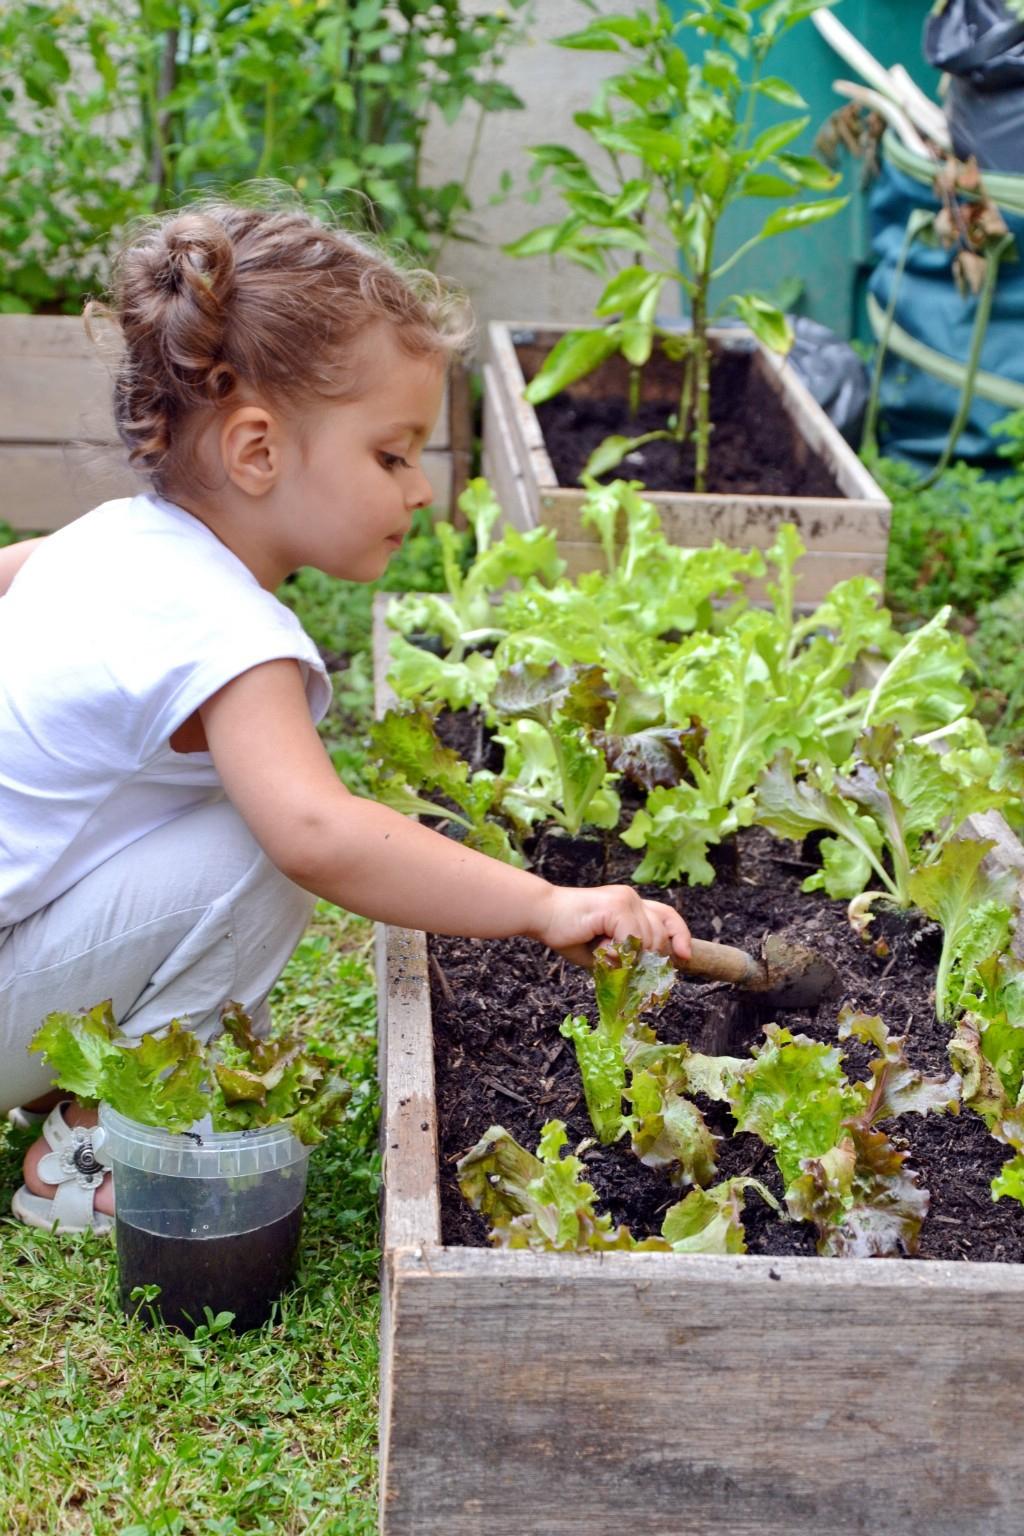 En Avril, Au Jardin Prenons Racine   Côté Brest concernant Arche Jardin Jardiland